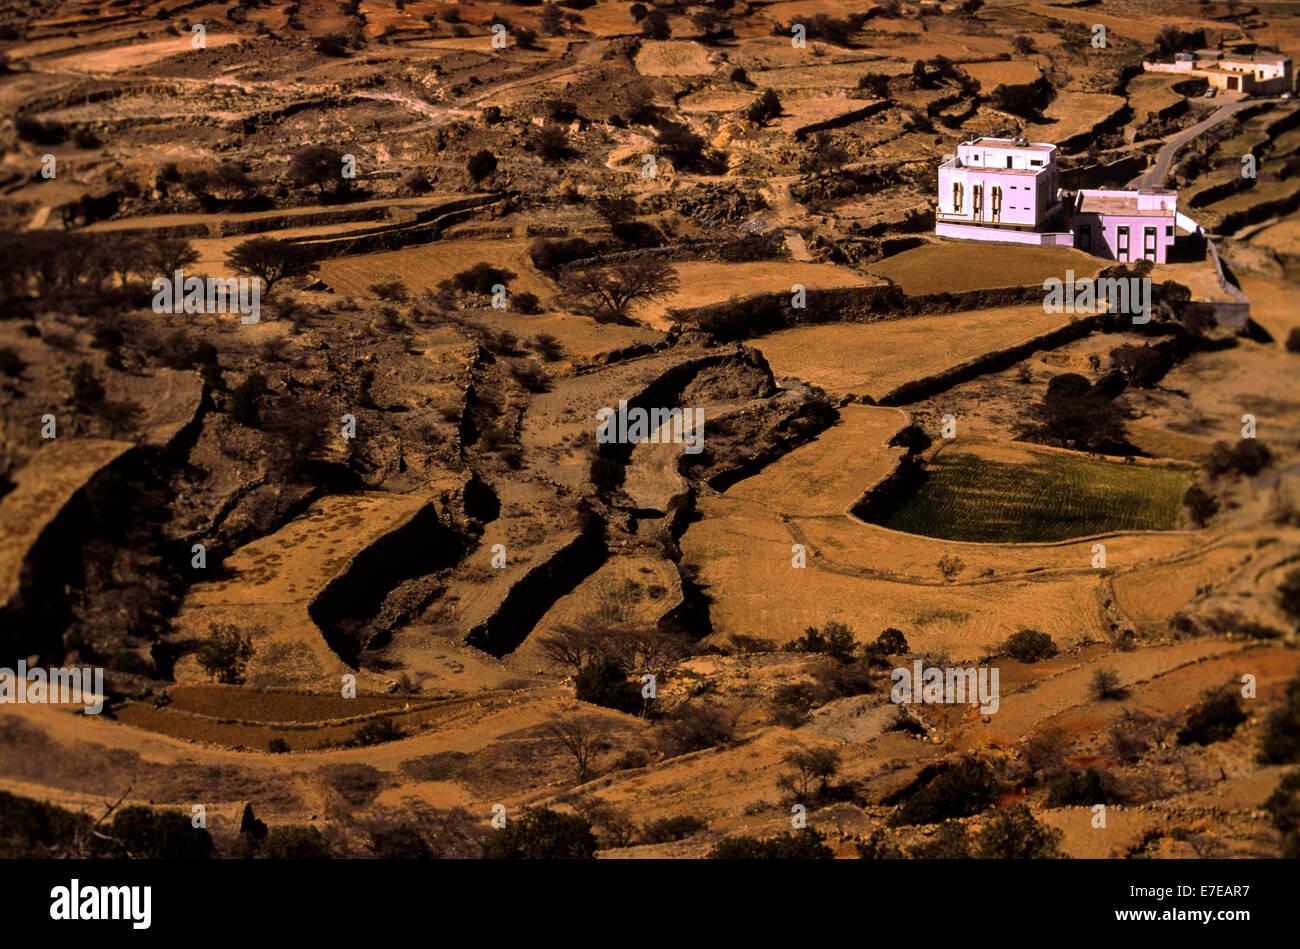 FARM HOUSES AND ARID FIELDS OF TERRACE FARMING IN ASIR  SAUDI ARABIA - Stock Image